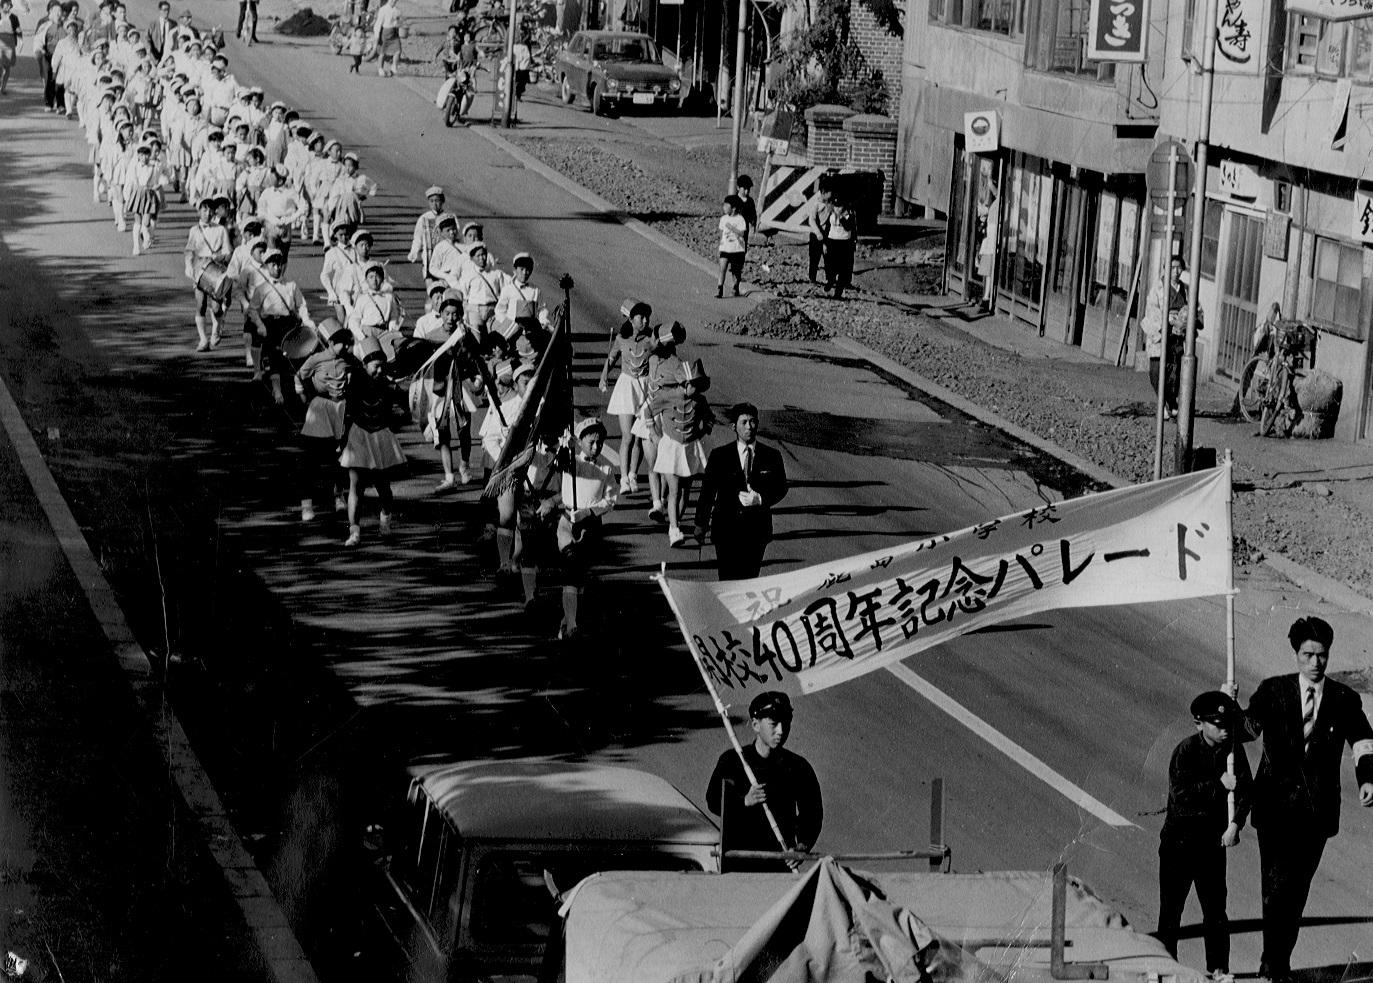 開校四十周年記念パレード#7/7